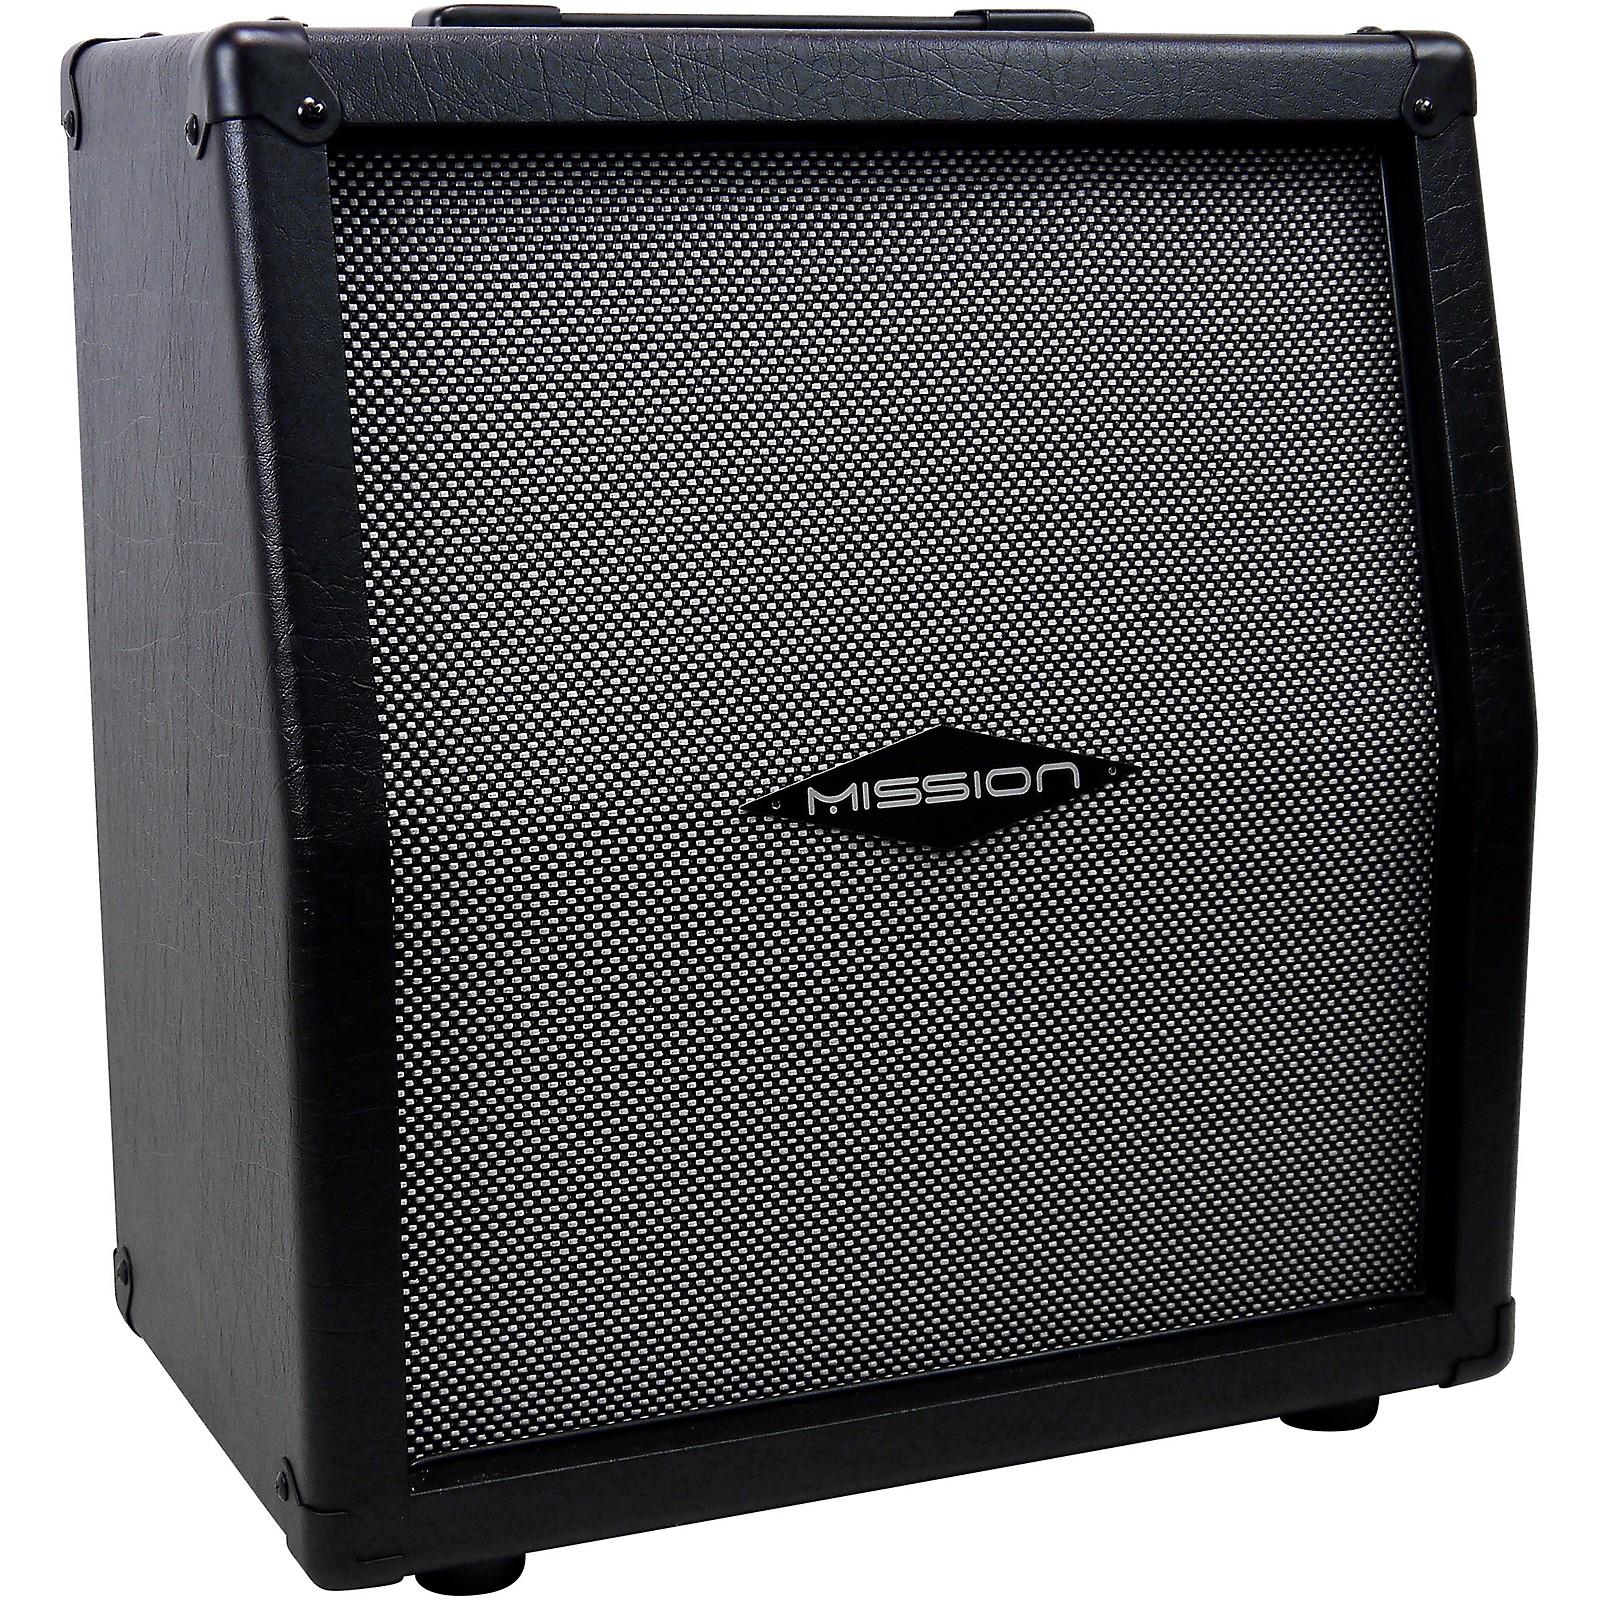 Mission Engineering GM-Io Powered Guitar Speaker Cabinet